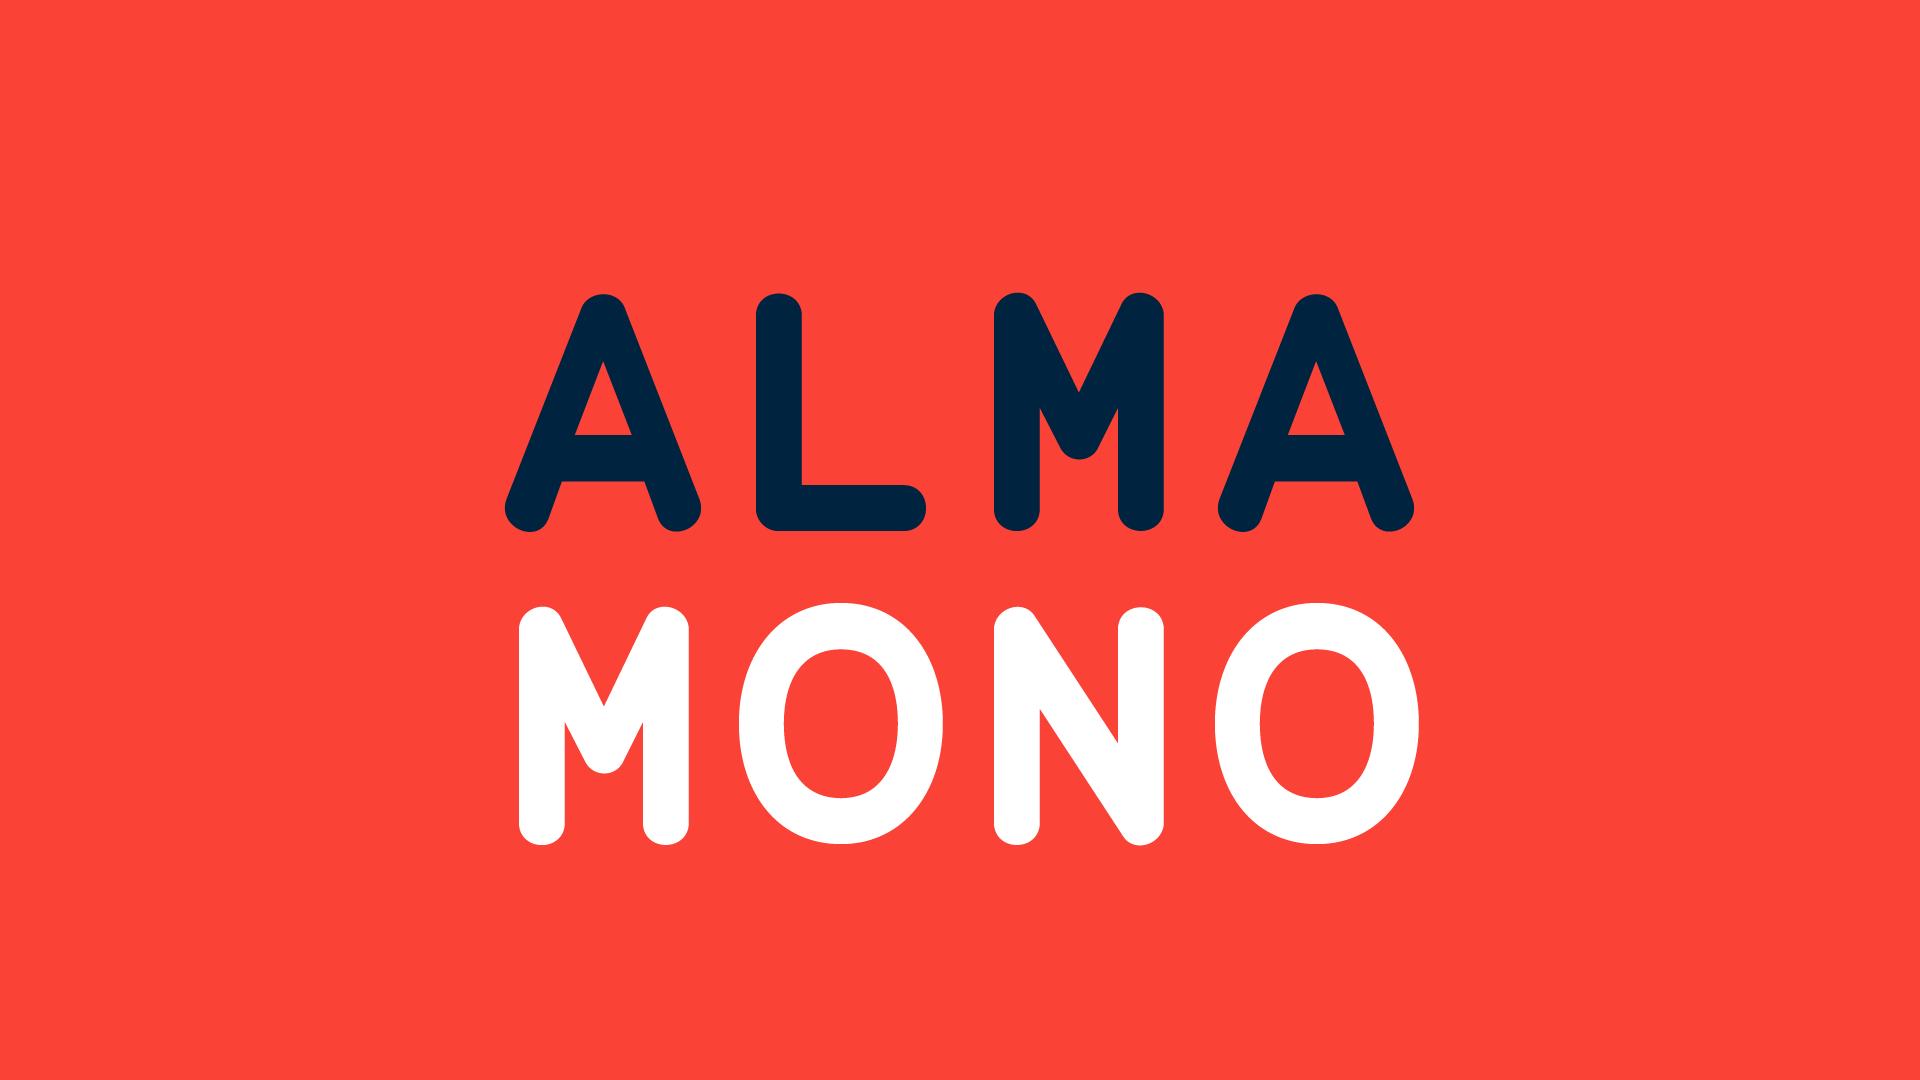 Alma Mono - top banner.png